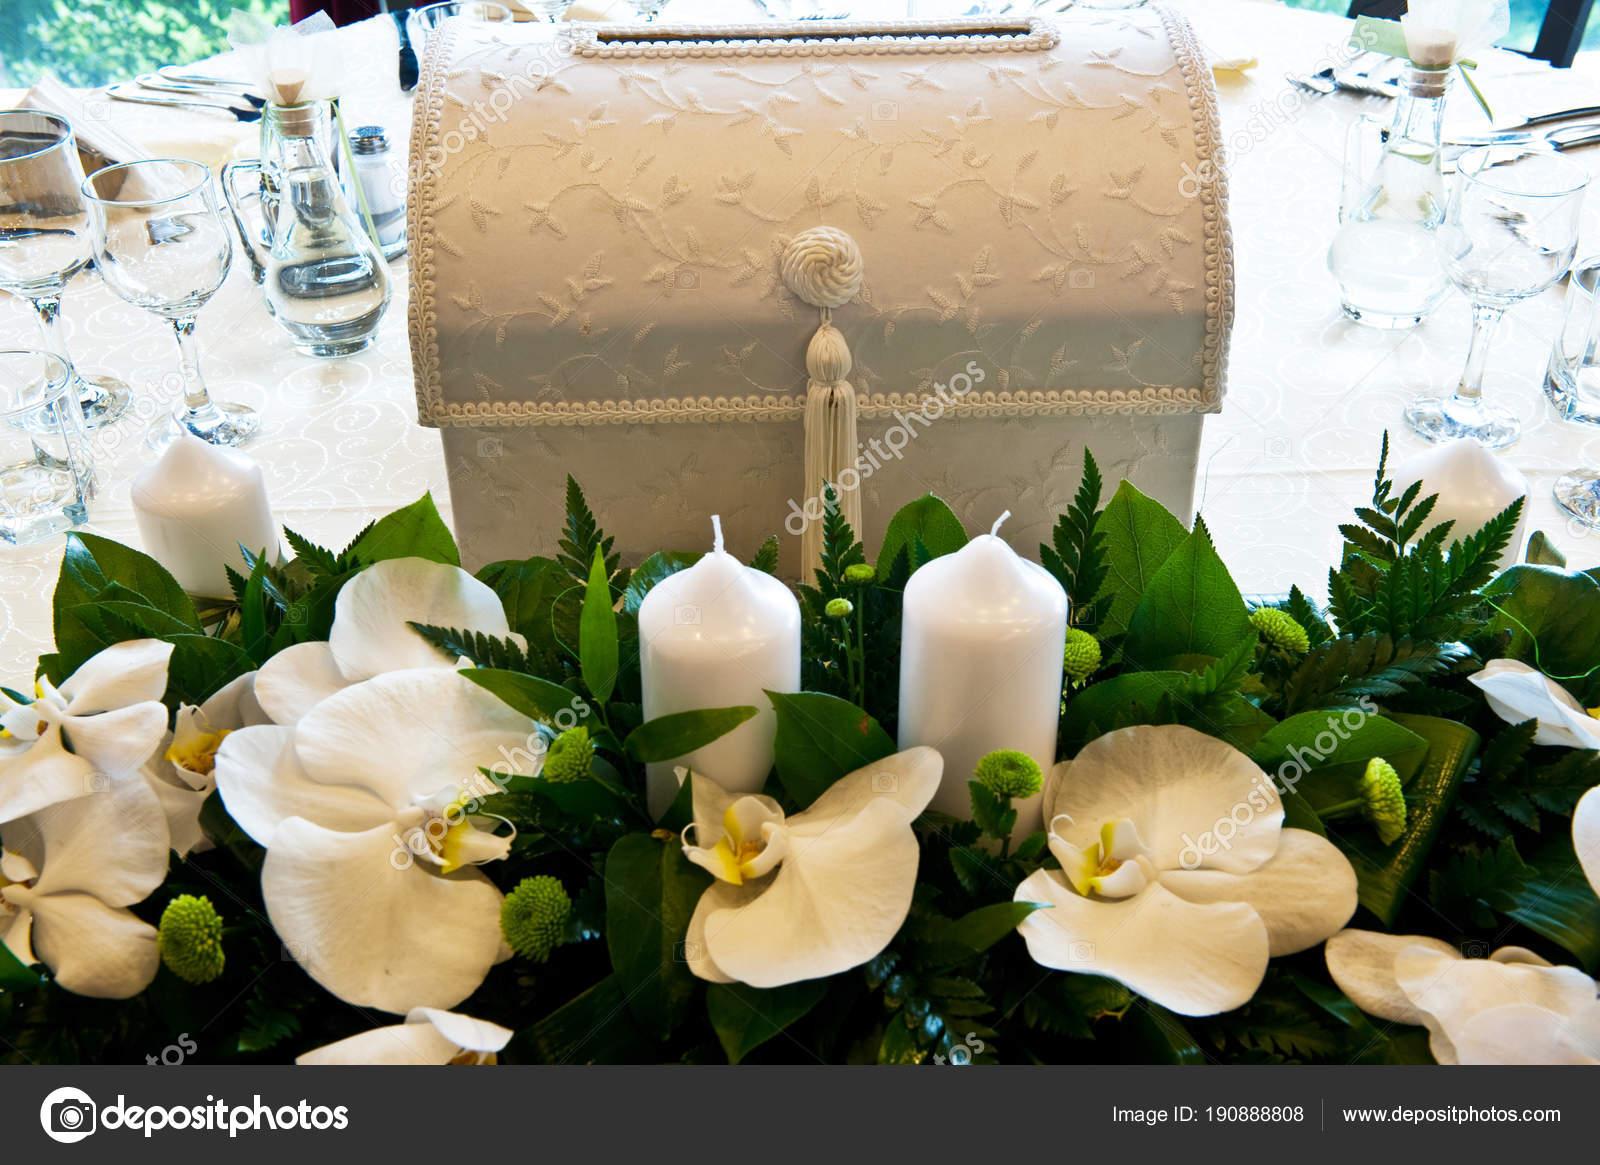 Dekorace Svatebni Stul Krasne Svatebni Doplnky Tabulce Udalosti